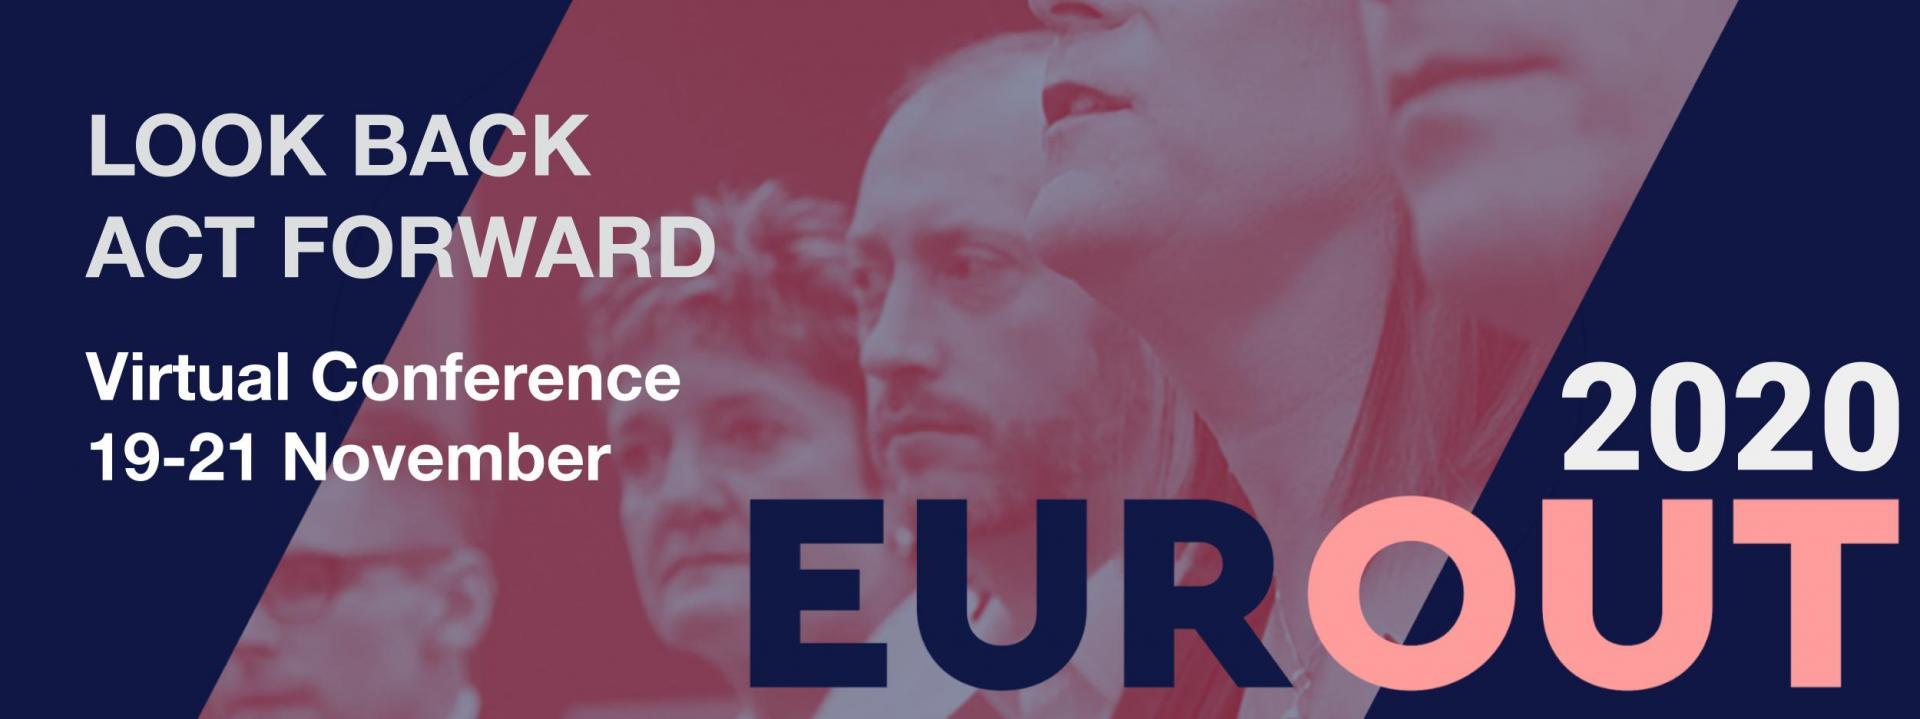 EUROUT 2020 - Look Back, Act Forward, Virtual Conference, 19 - 21 November 2020